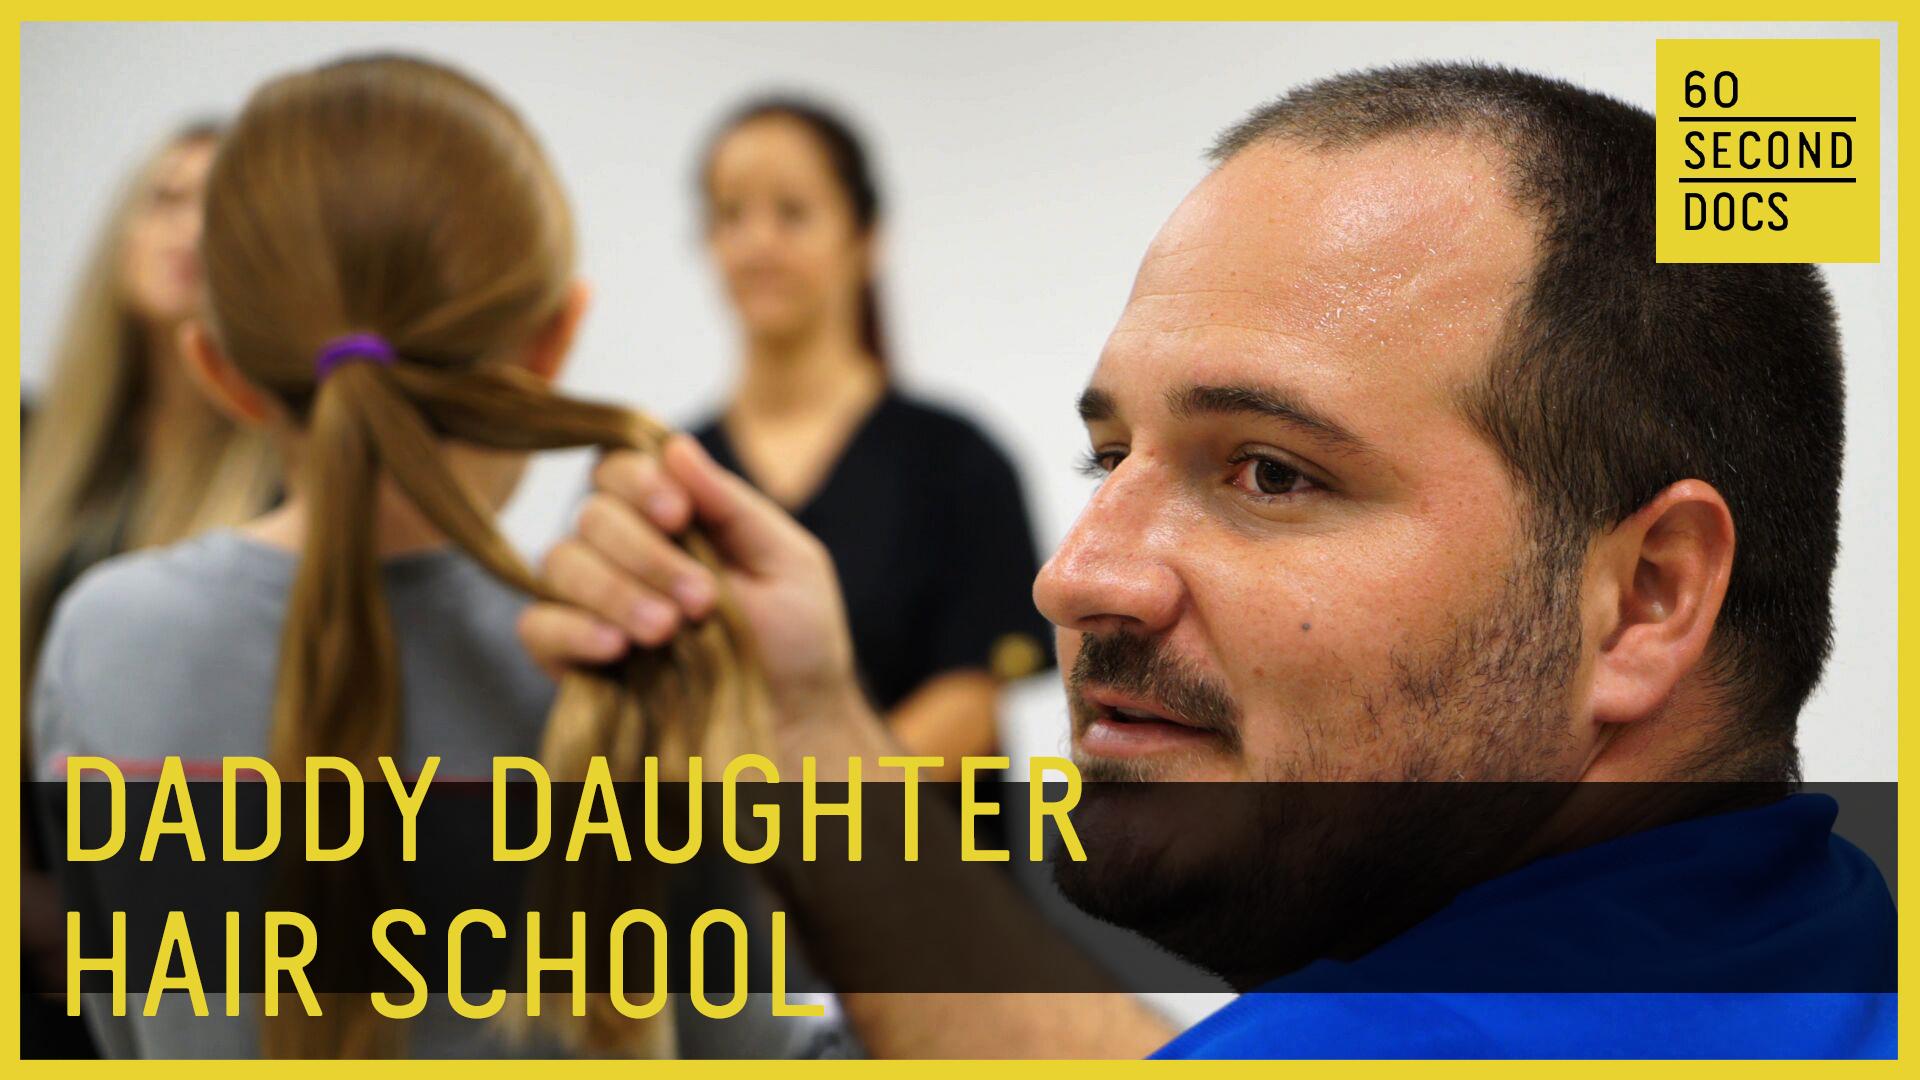 Daddy Daughter Hair School.jpg